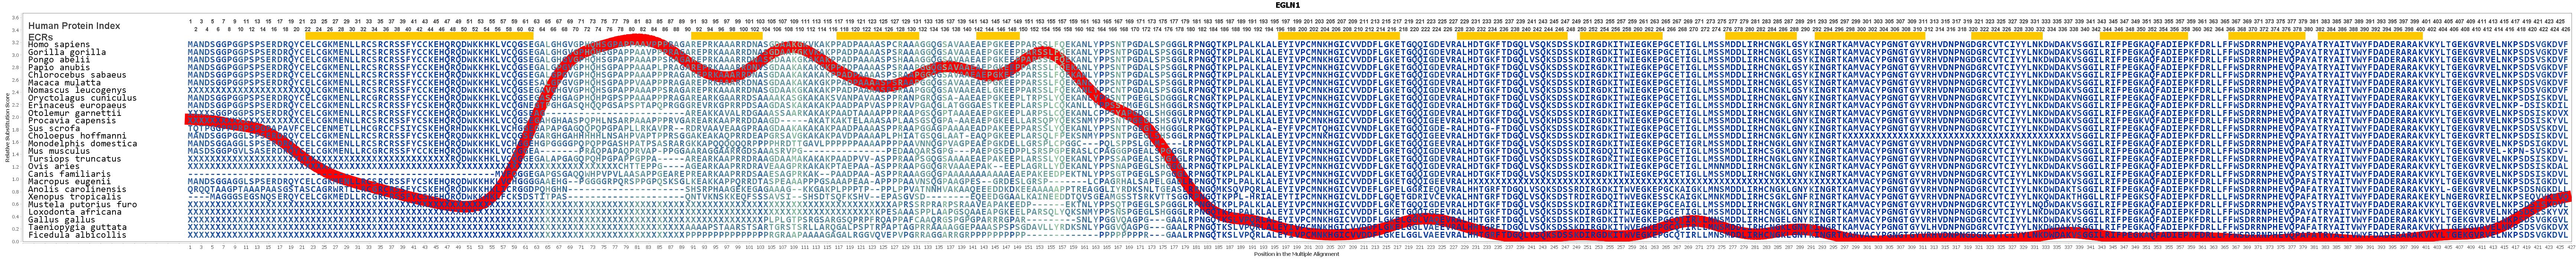 EGLN1 Gene - GeneCards | EGLN1 Protein | EGLN1 Antibody